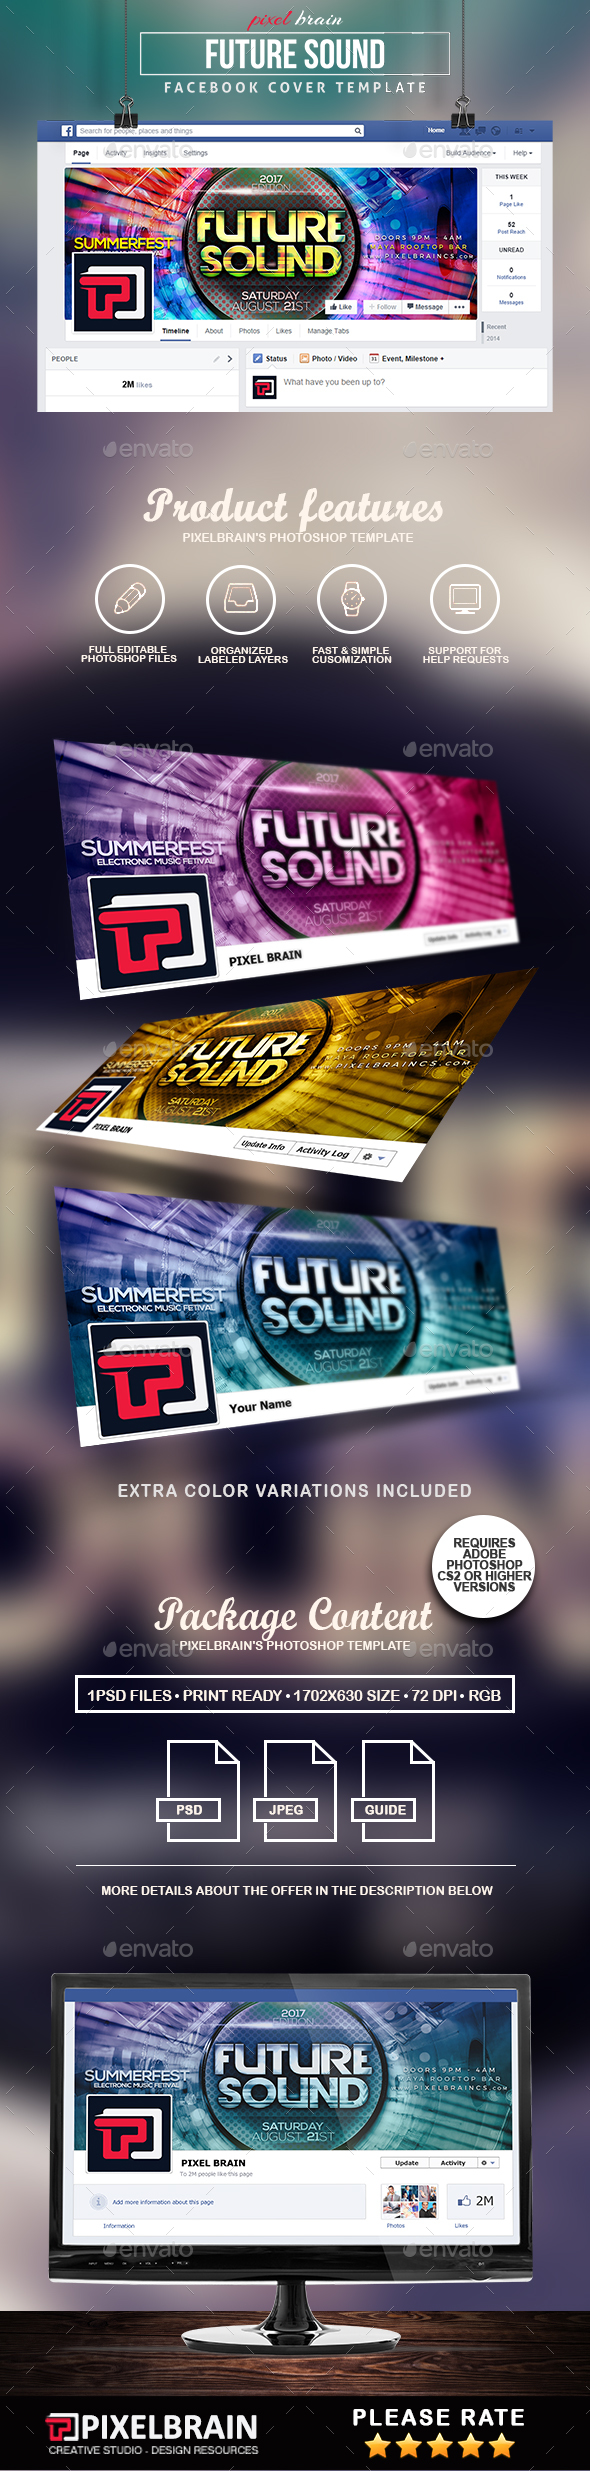 Future Sound Facebook Cover Template - Facebook Timeline Covers Social Media